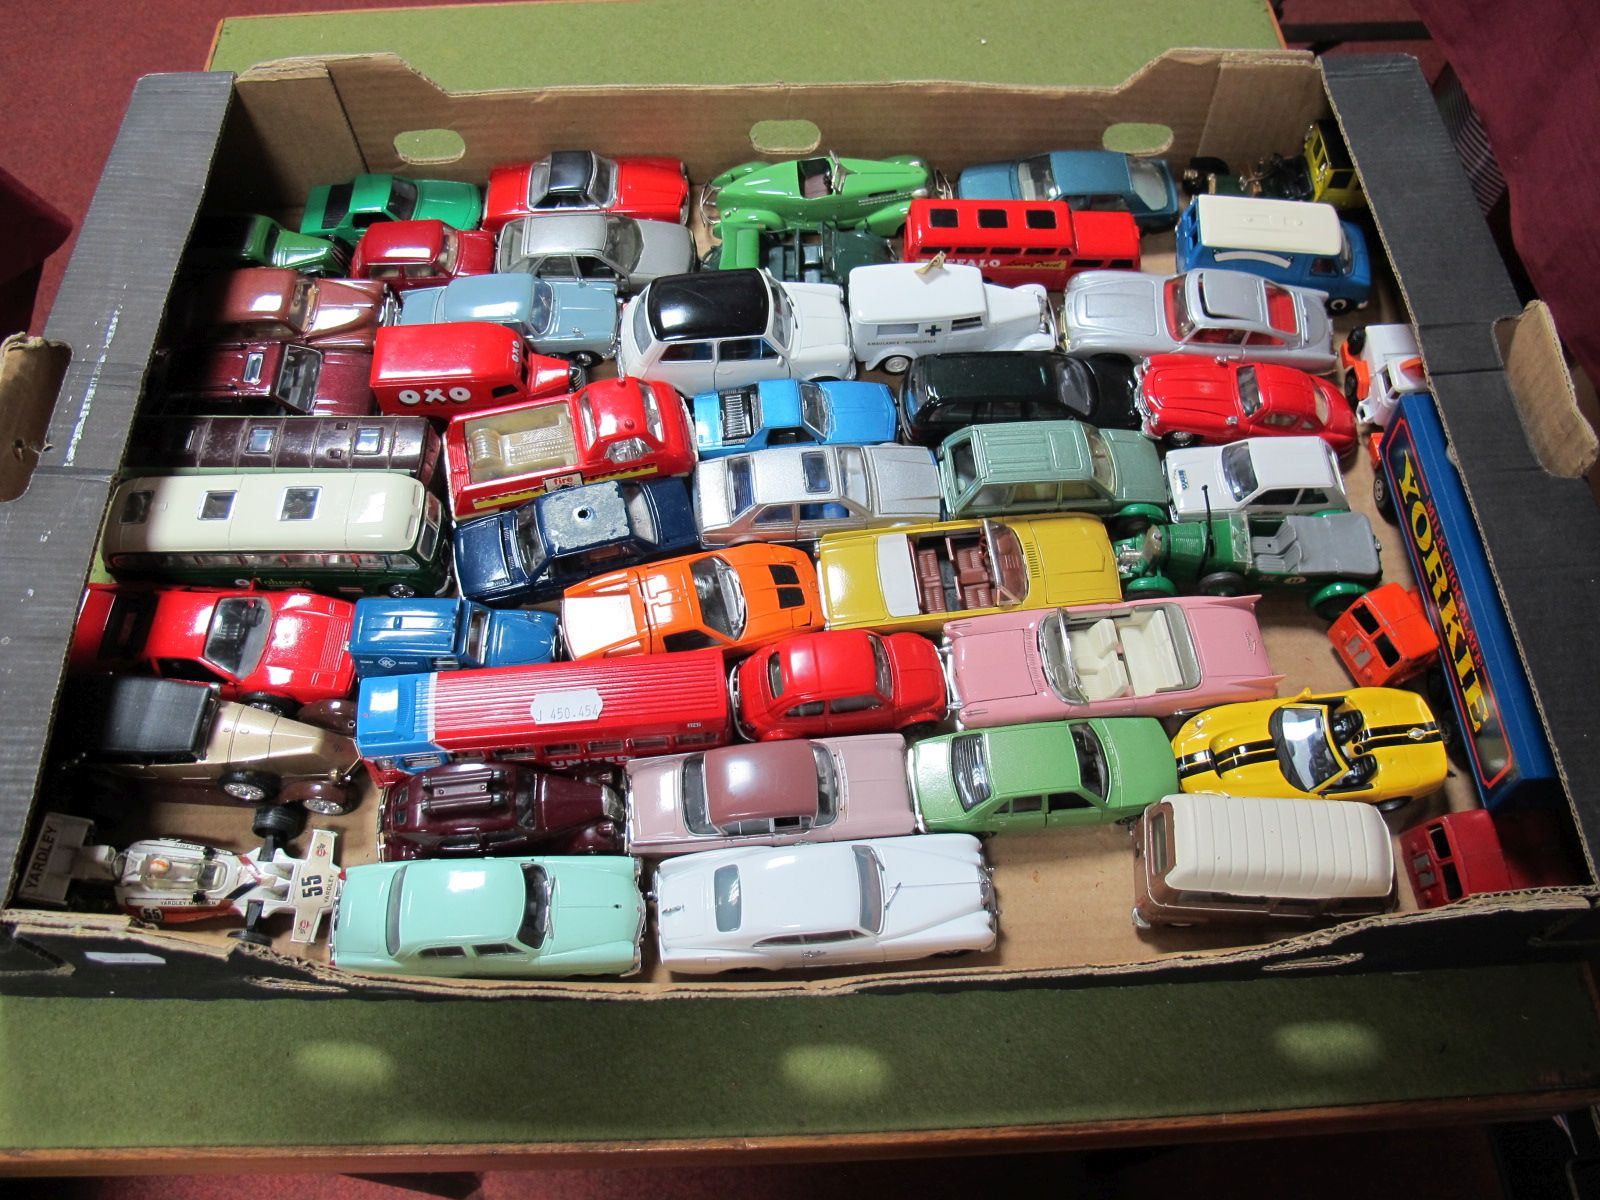 Lot 47 - A Quantity of Modern Diecast Vehicles by Corgi, De Agostini, EFE, Burago, Mattel, Solido, Days Gone,